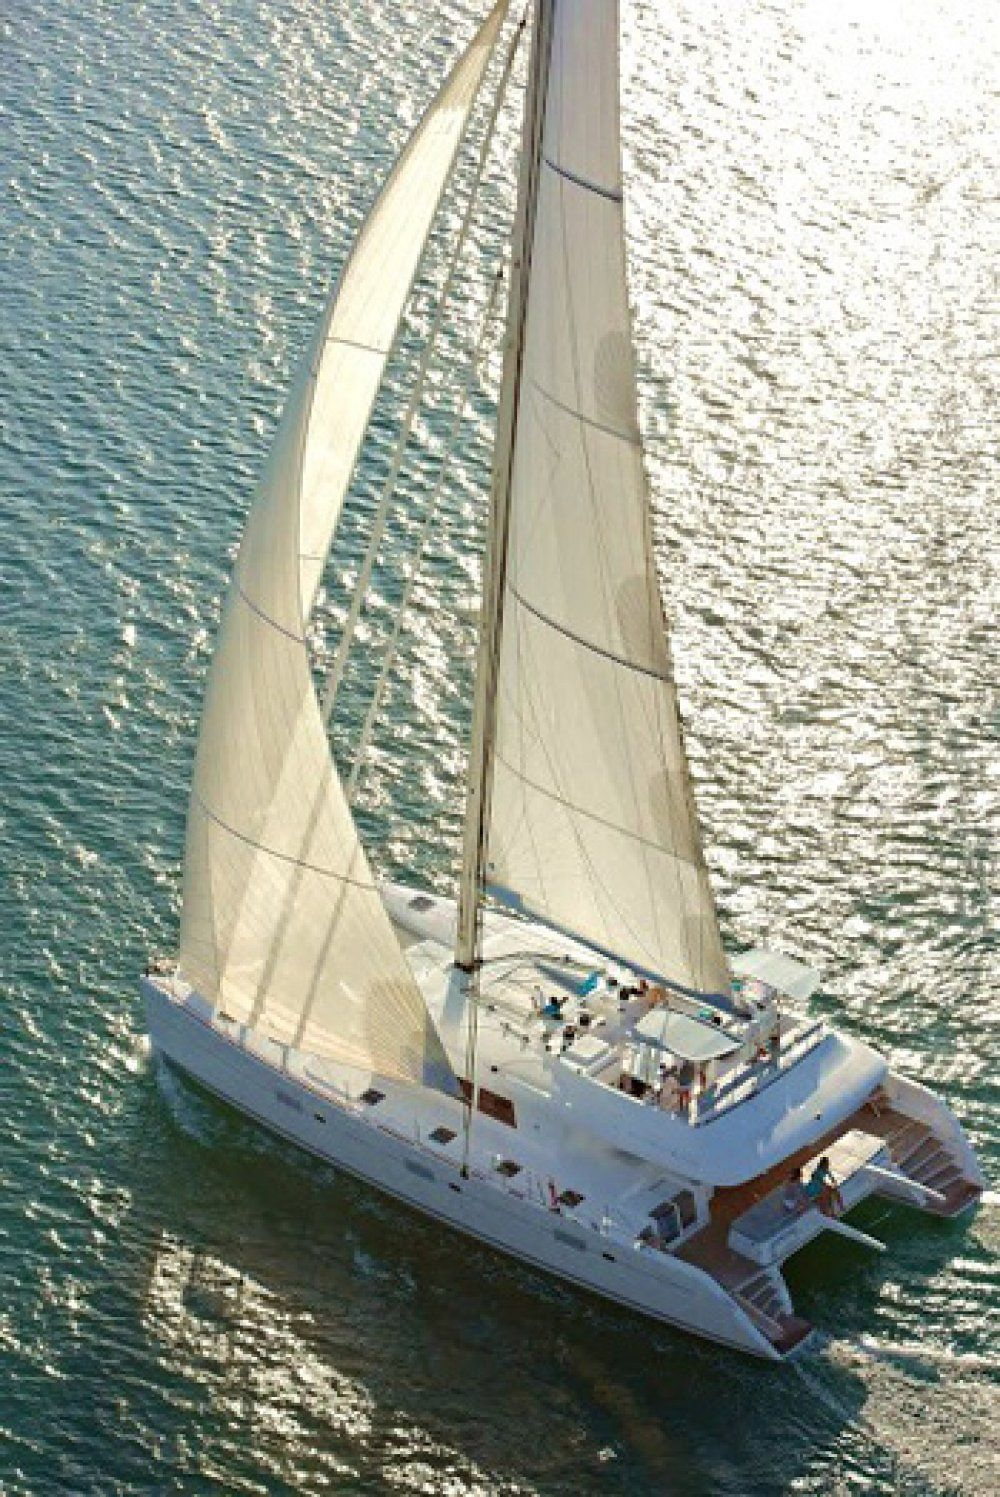 Charter catamaran foxy lady virgin islands for By the cabin catamaran charters